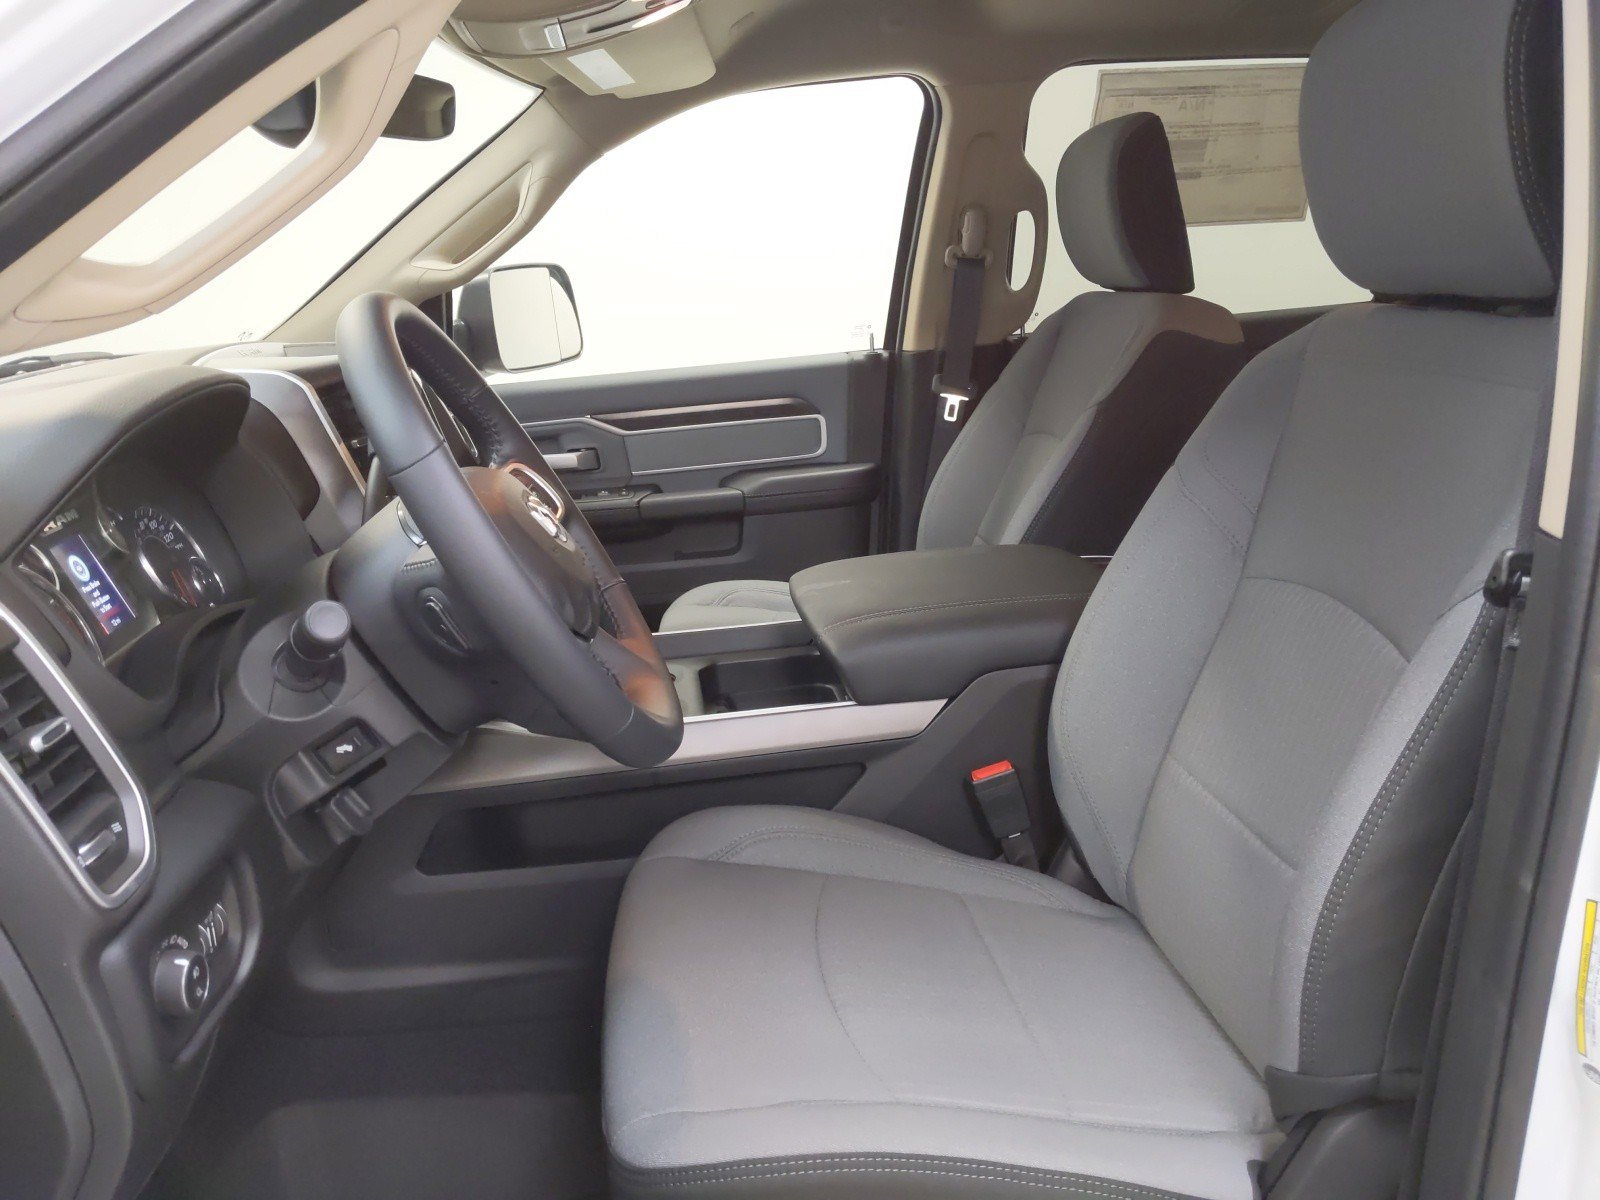 New 2020 Ram 2500 Big Horn Crew Cab Pickup for sale in Grand Island NE